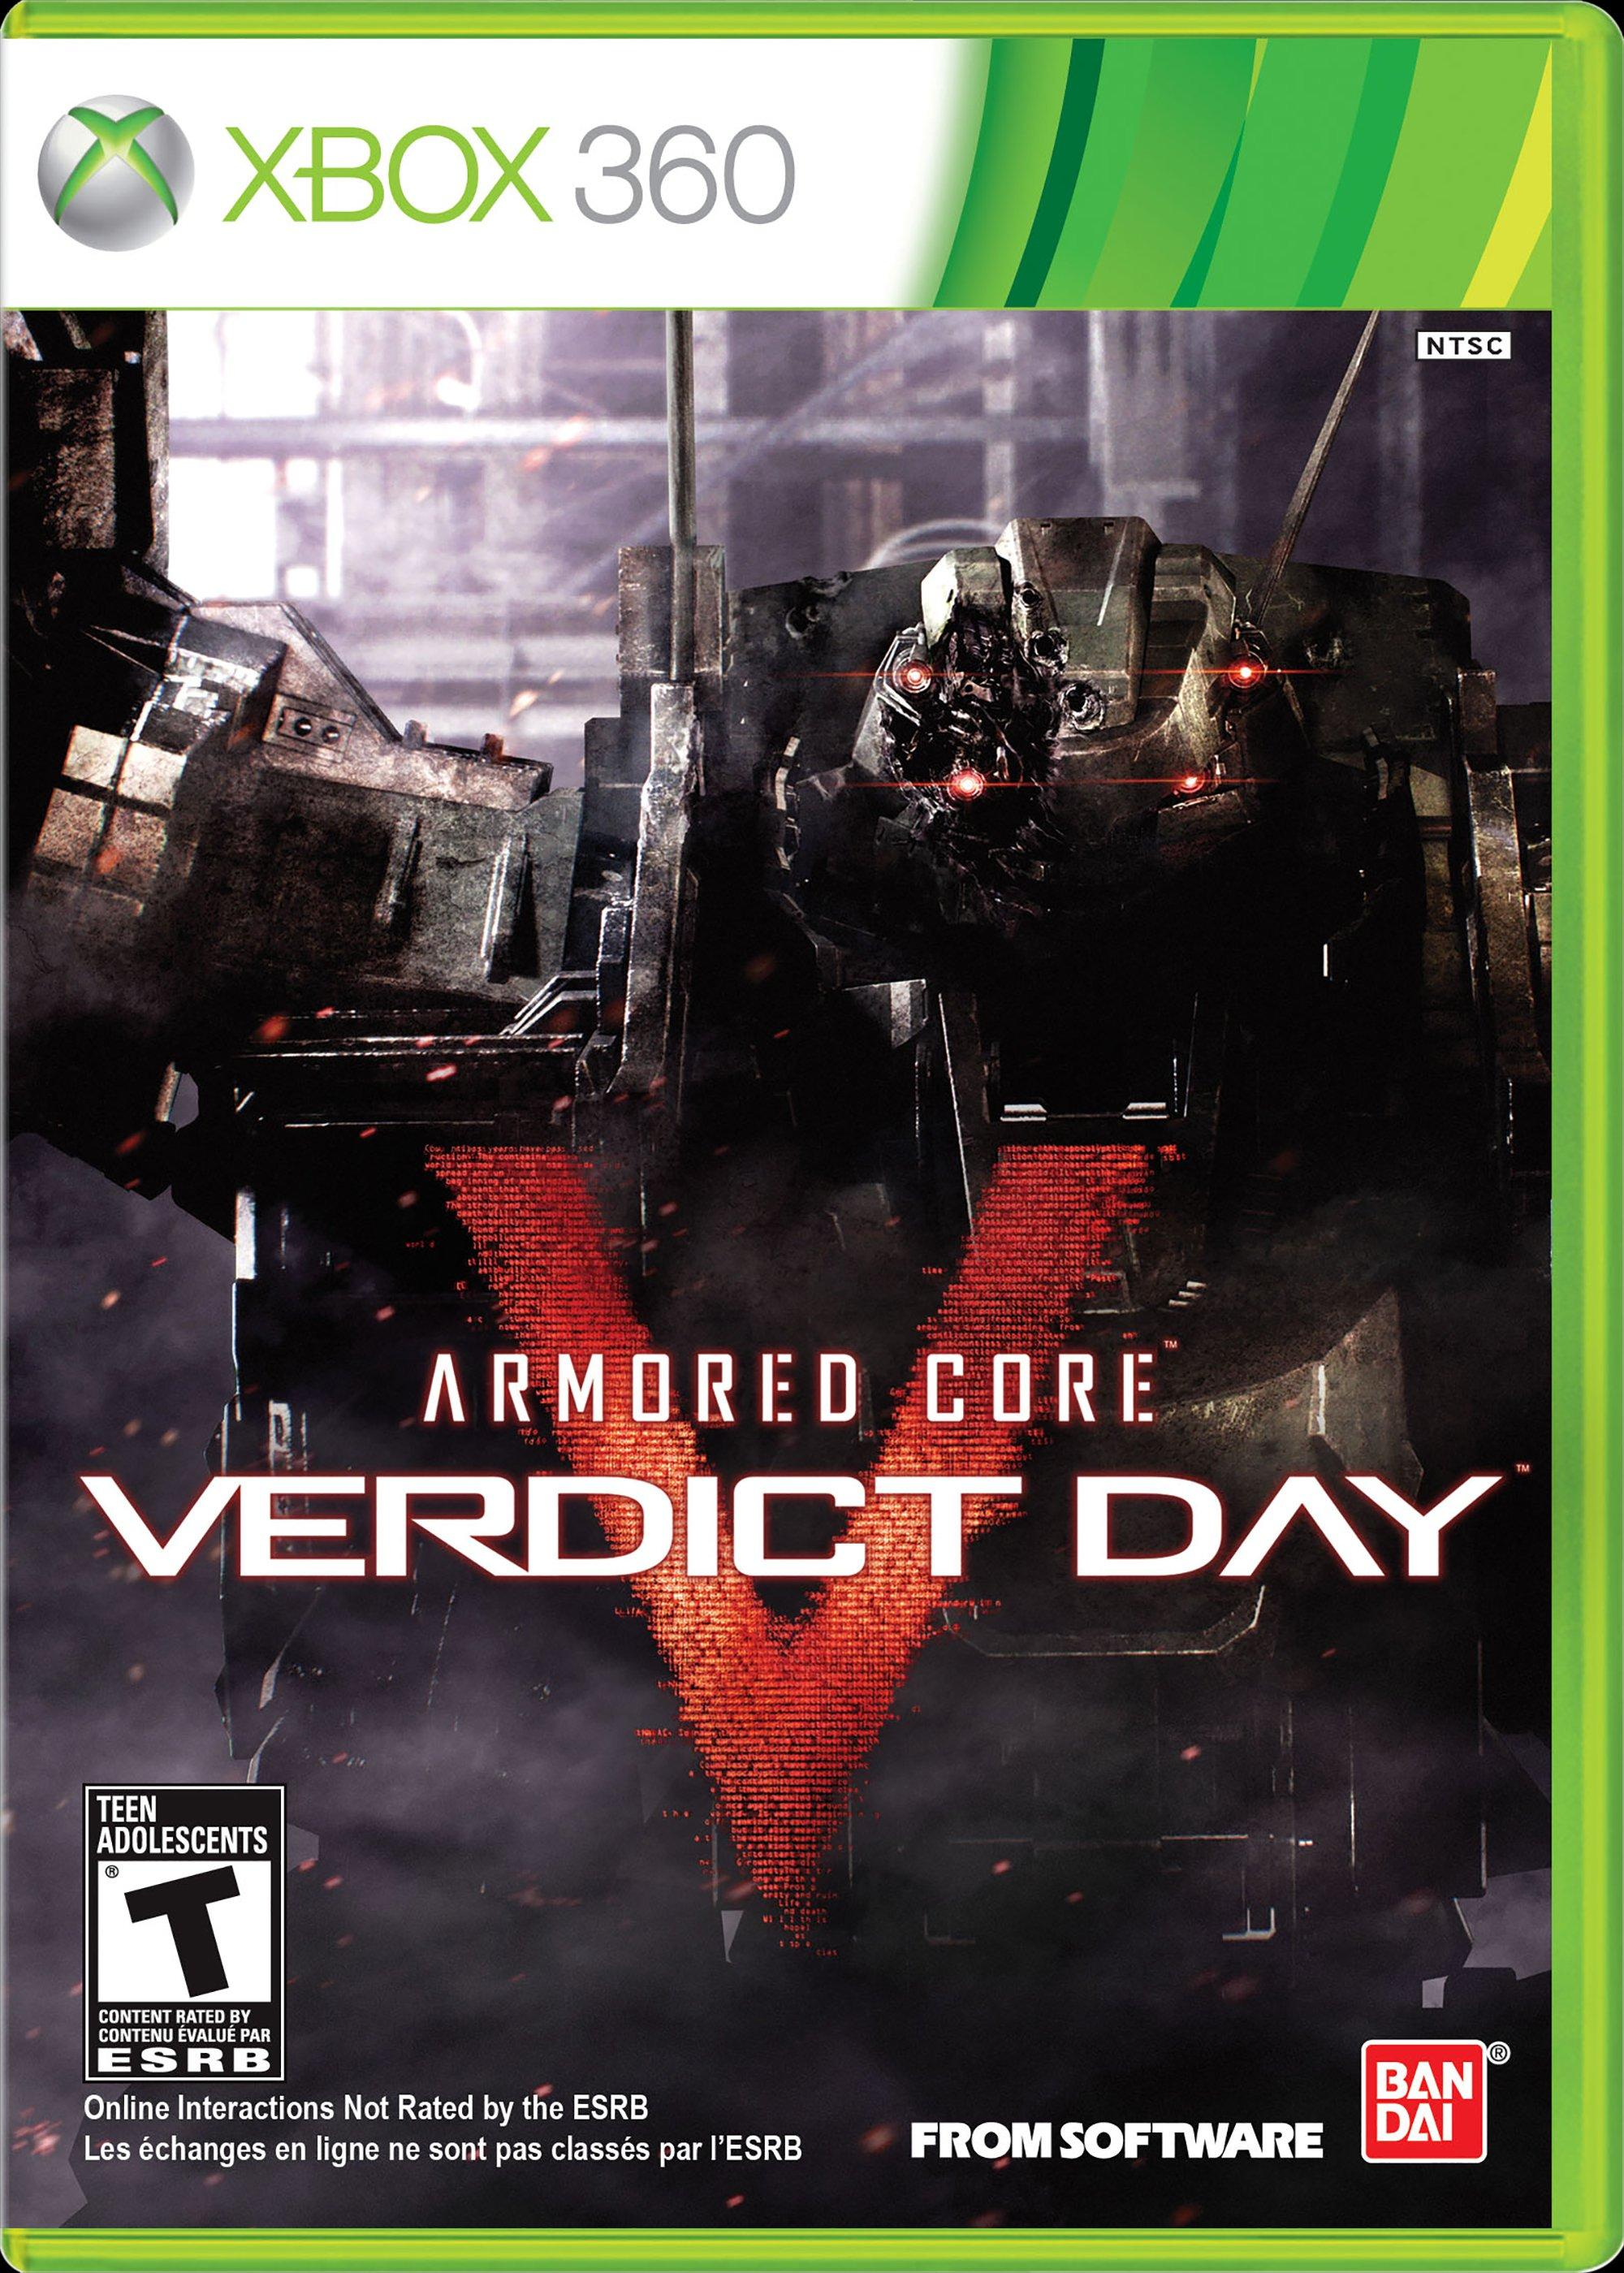 Armored Core: Verdict DayXbox 360 | GameStop on